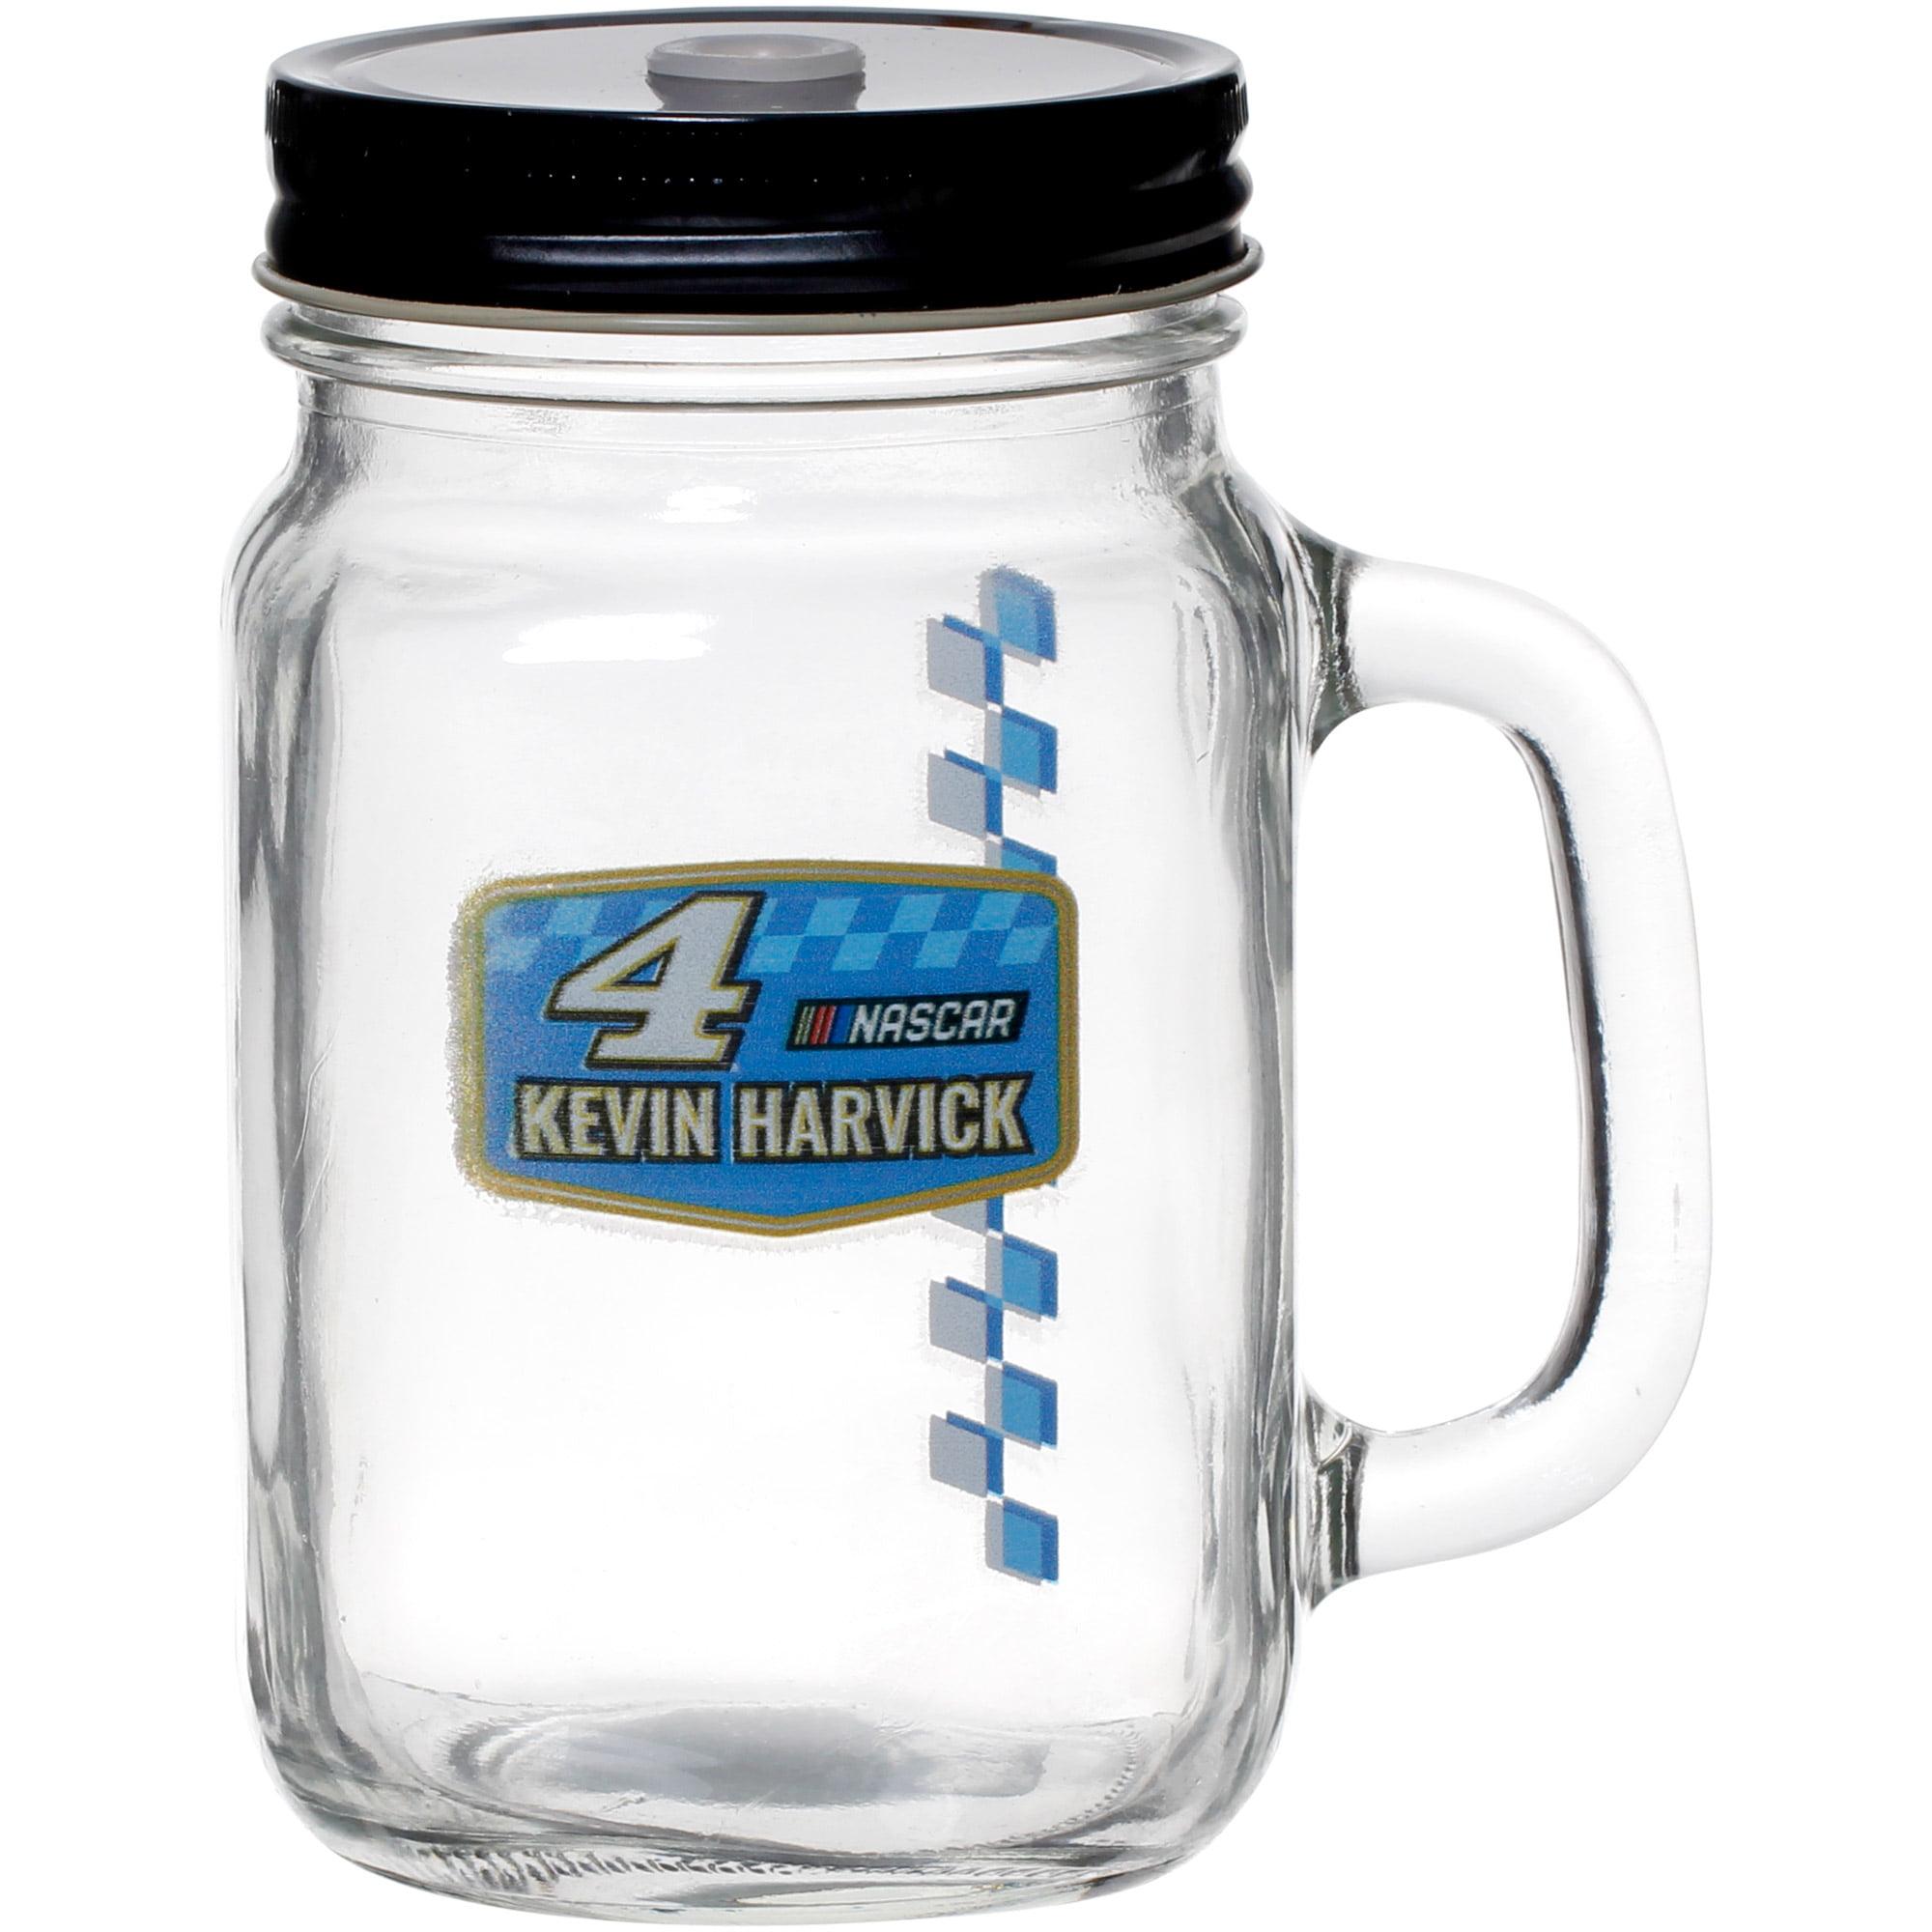 Kevin Harvick 16oz. Mason Jar with Lid & Straw - No Size